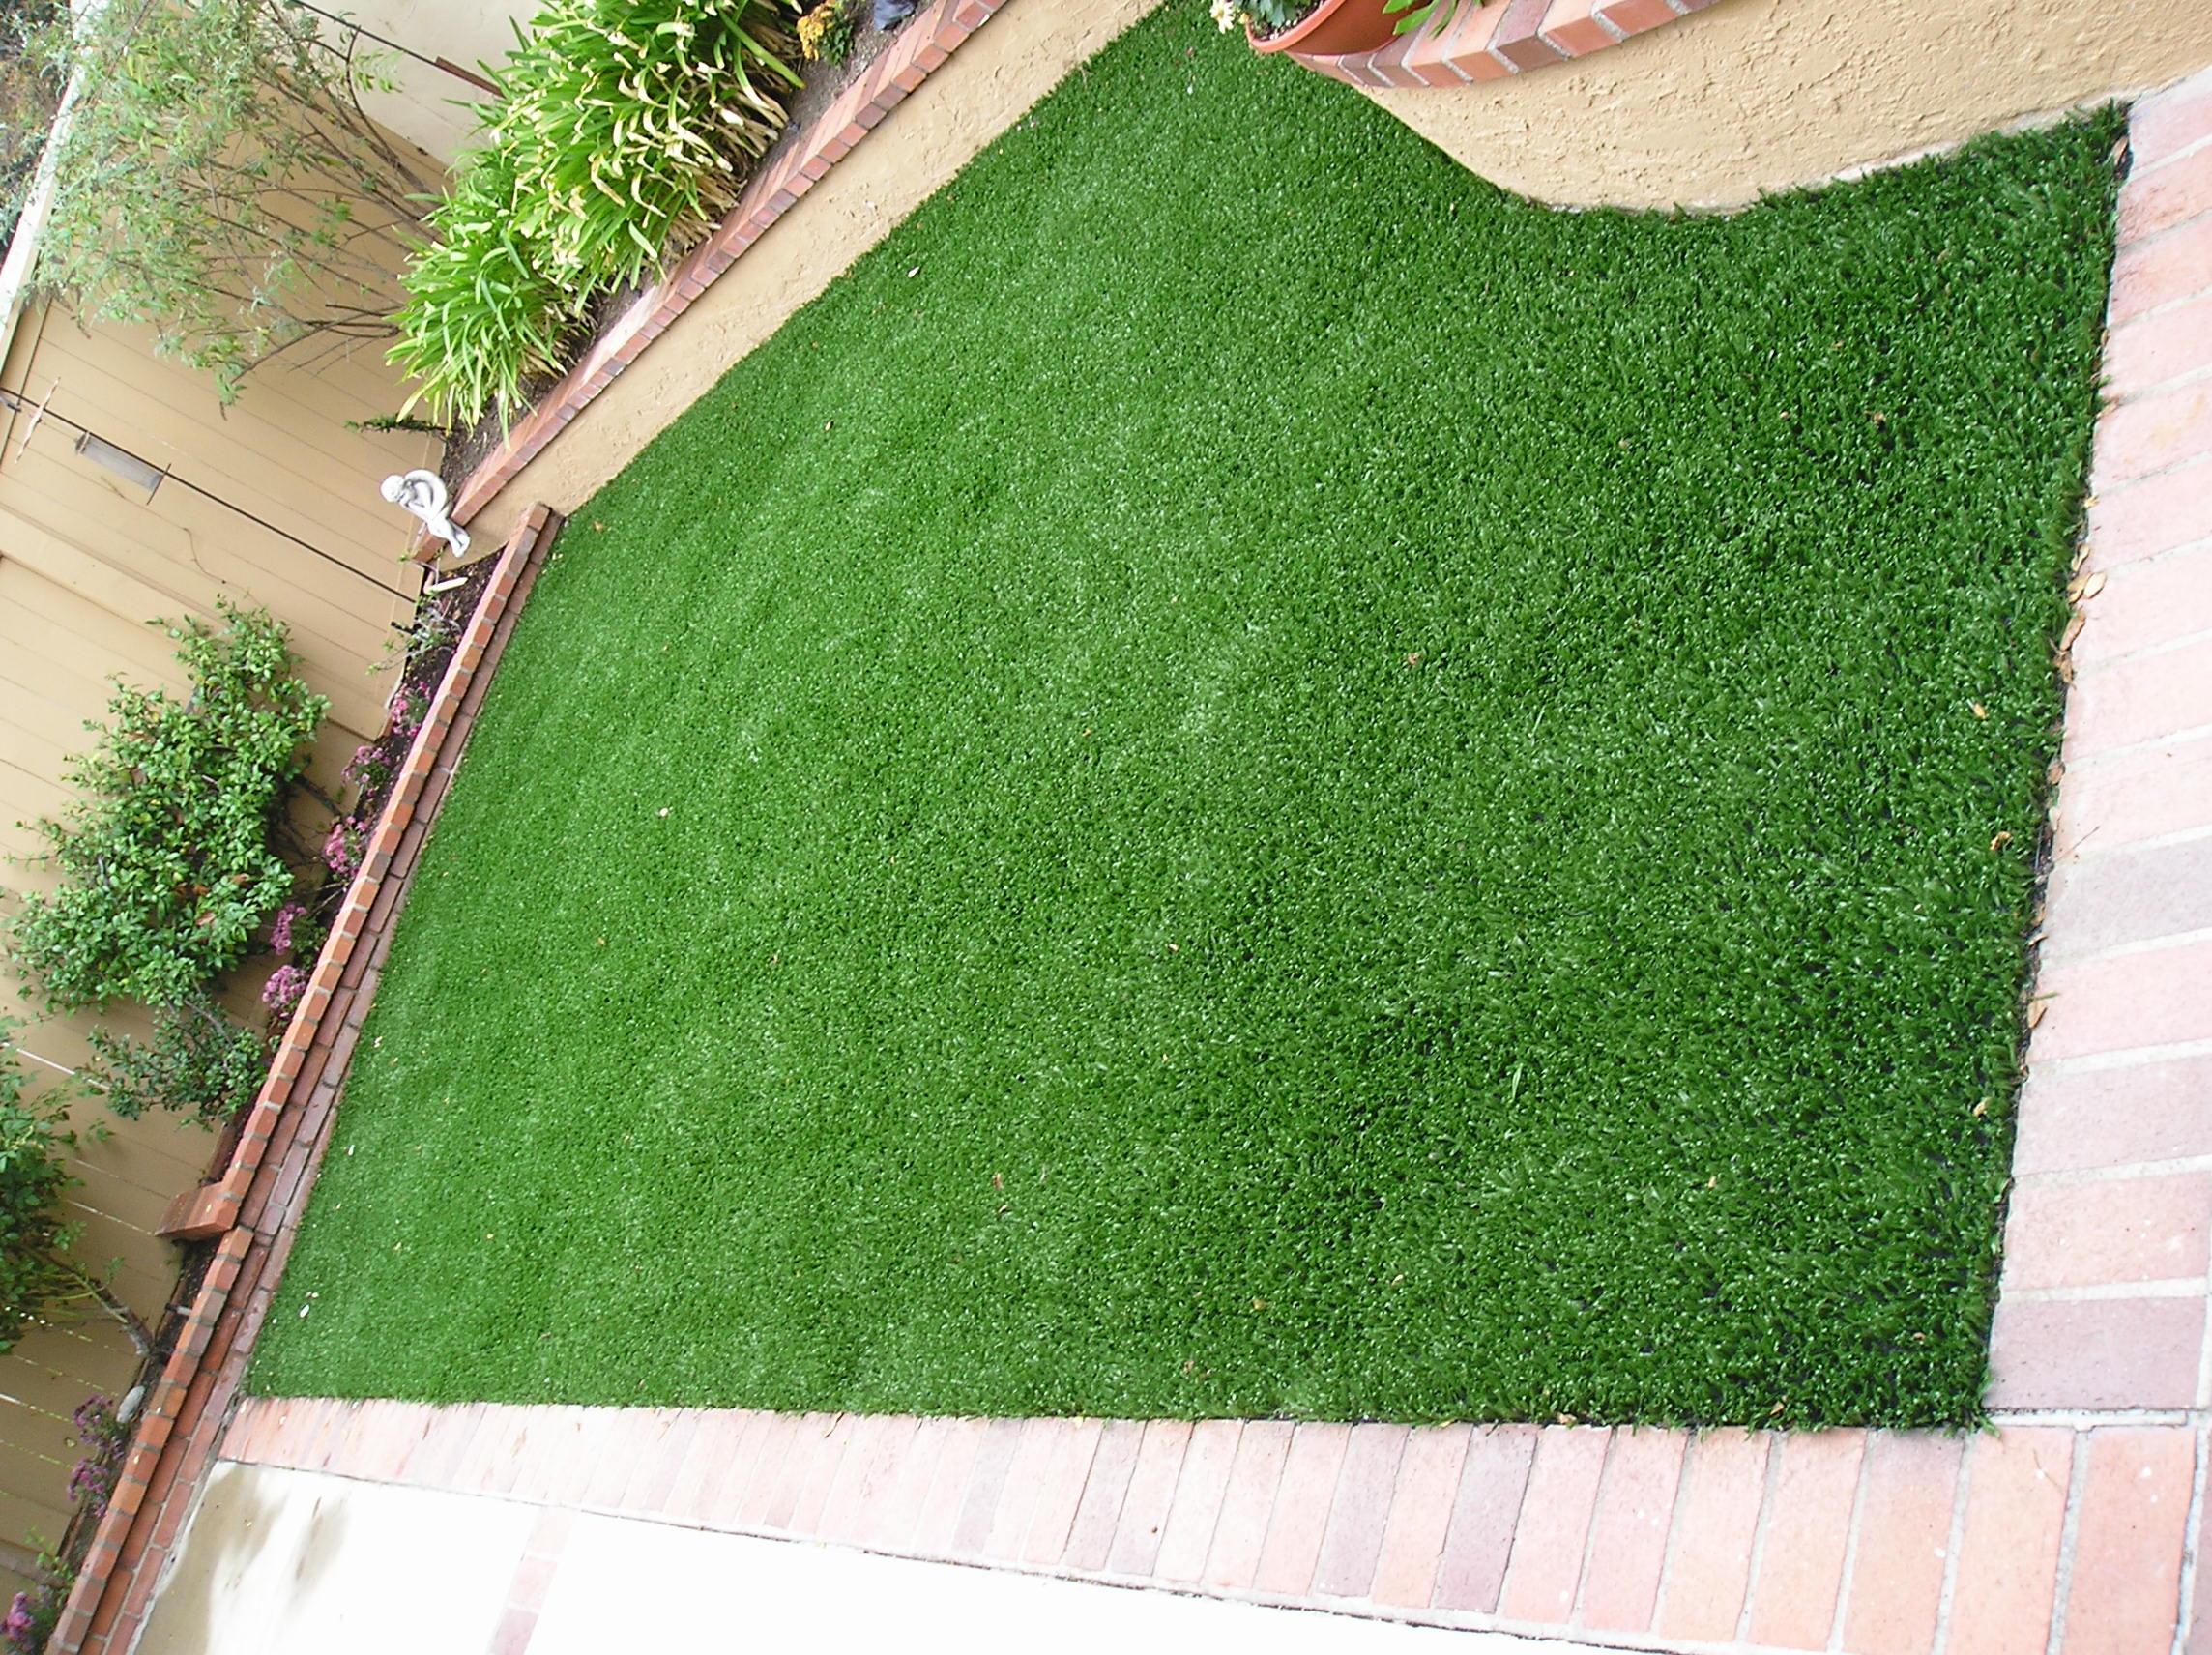 Super Natural 80 artificial grass installers,artificial turf installers,artificial turf,synthetic turf,artificial turf installation,how to install artificial turf,used artificial turf